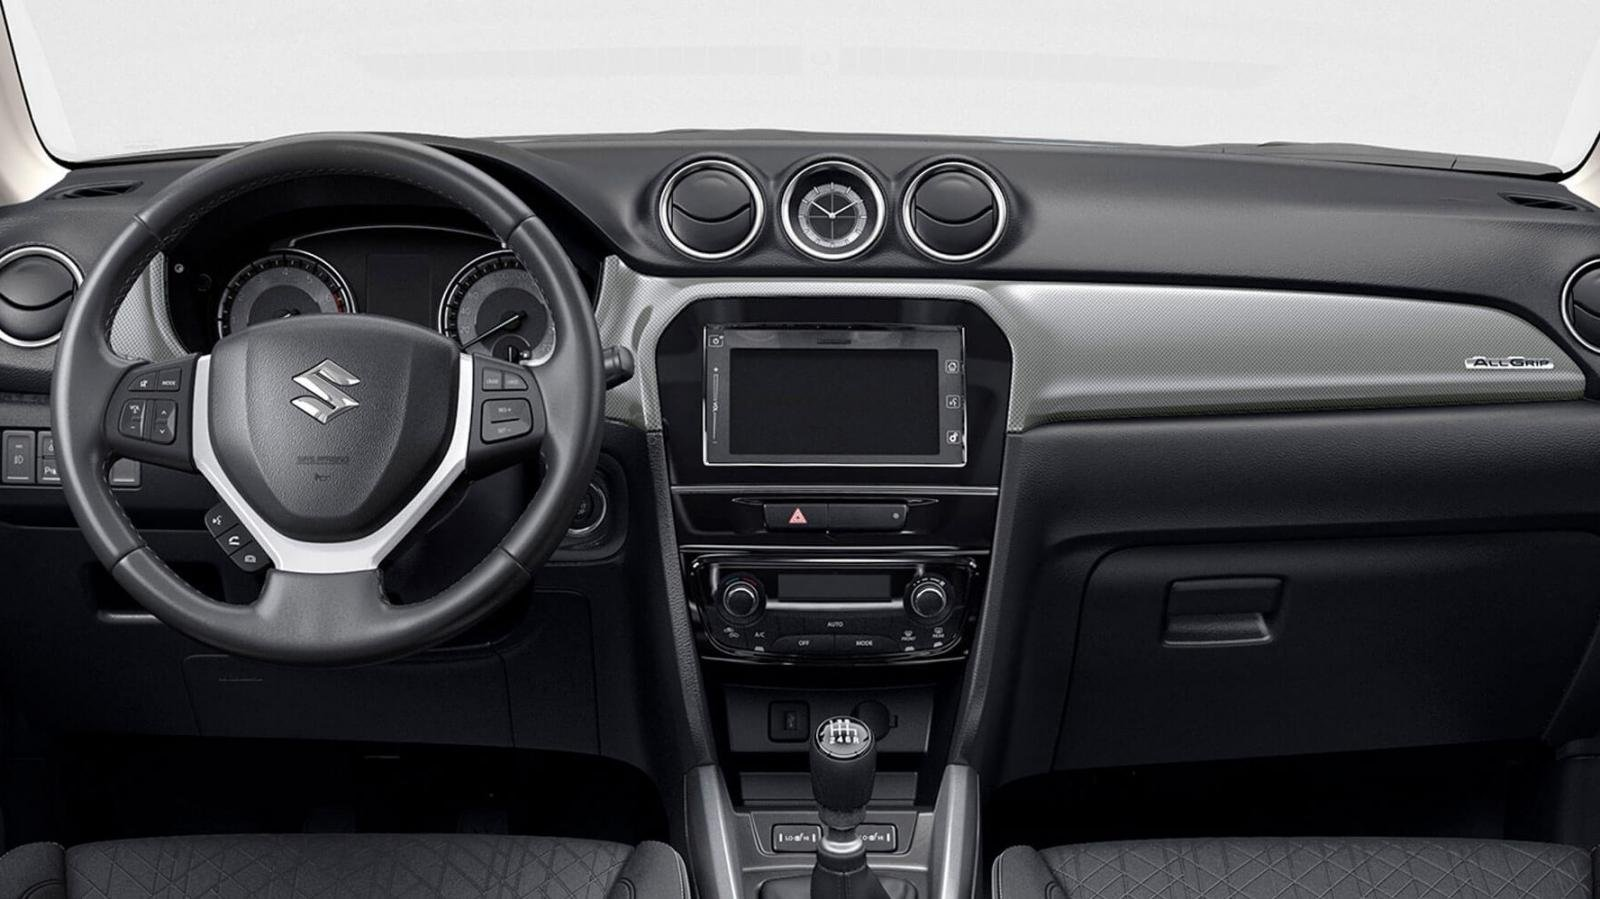 La Suzuki Vitara ofrece un interior funcional